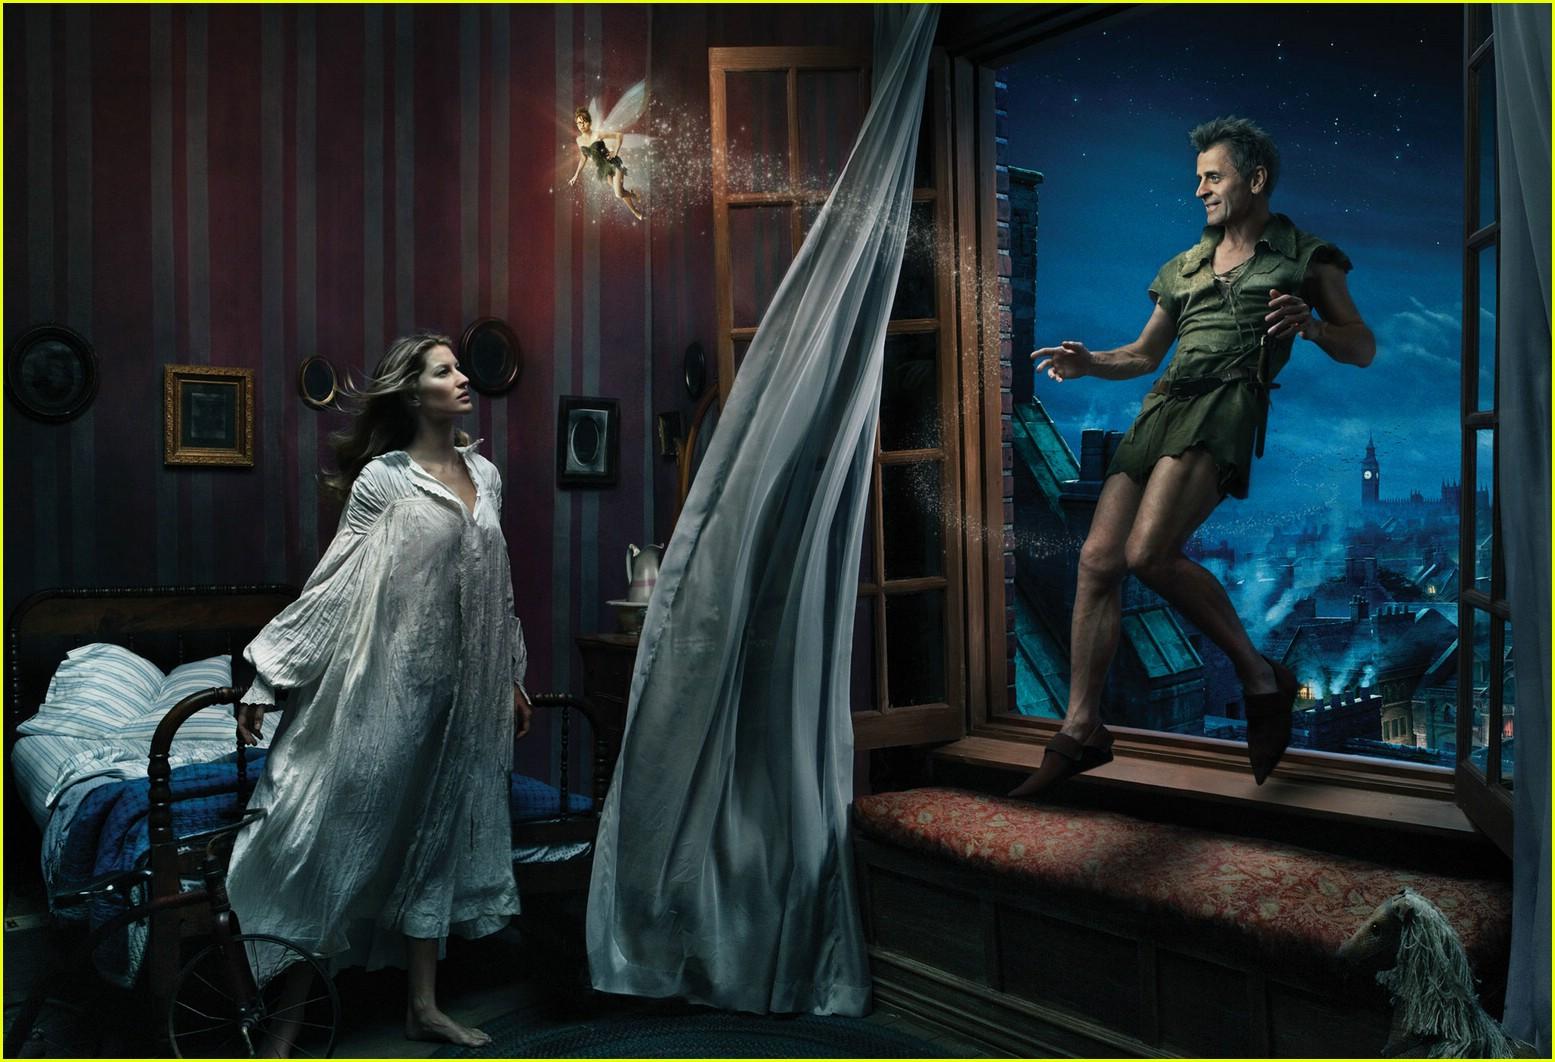 http://3.bp.blogspot.com/_vvDWoG_XX-0/TQn2Wr-Uh6I/AAAAAAAABGY/DNlL-2Jnxls/s1600/disney-dream-ads-annie-leibovitz-08.jpg